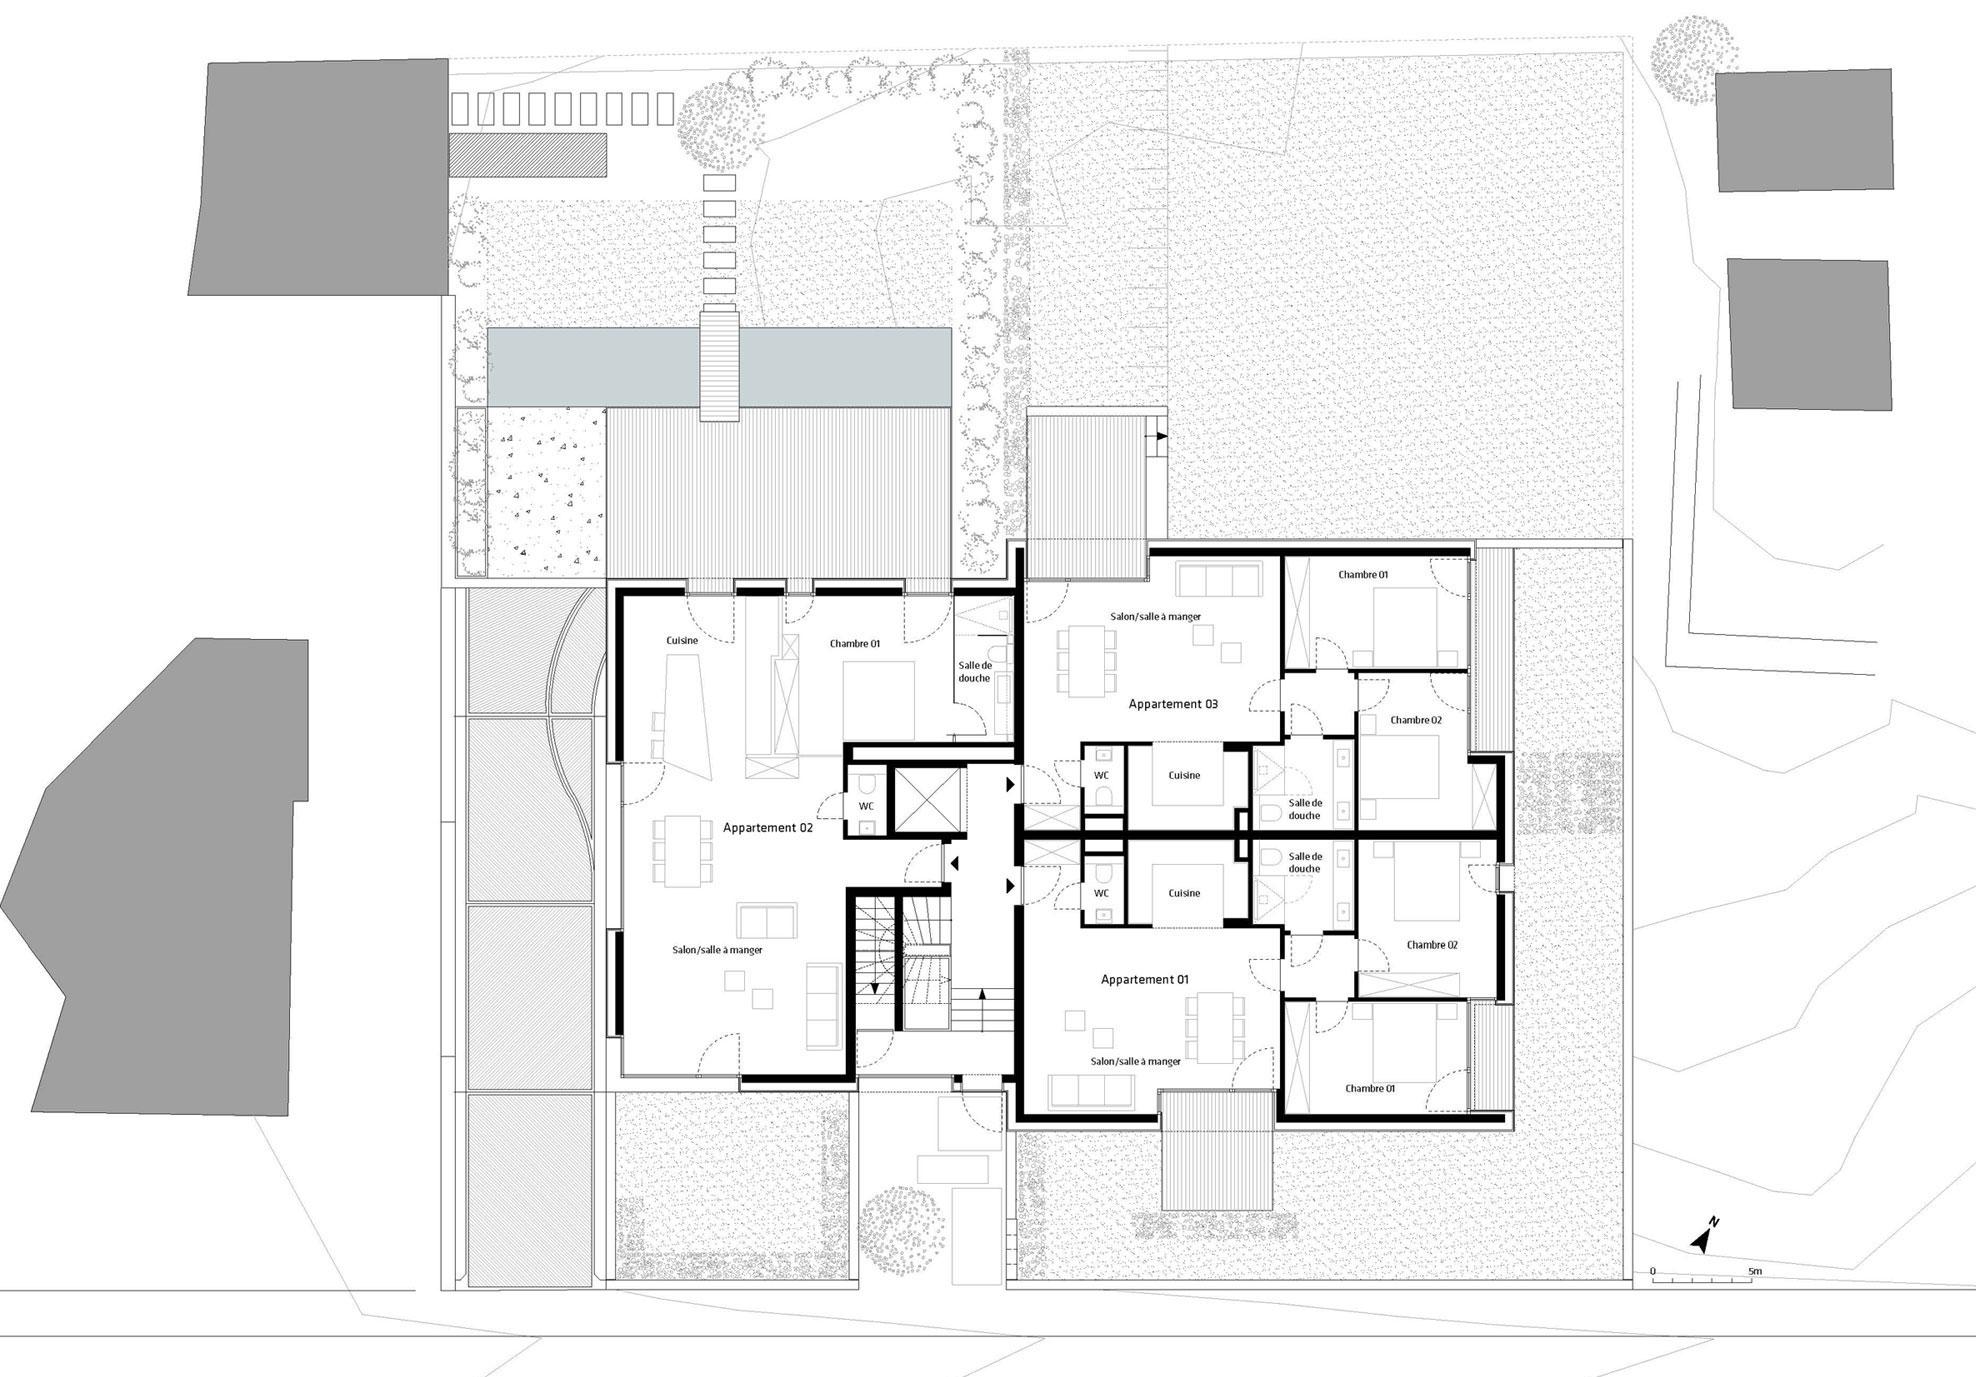 Housing-Building-11